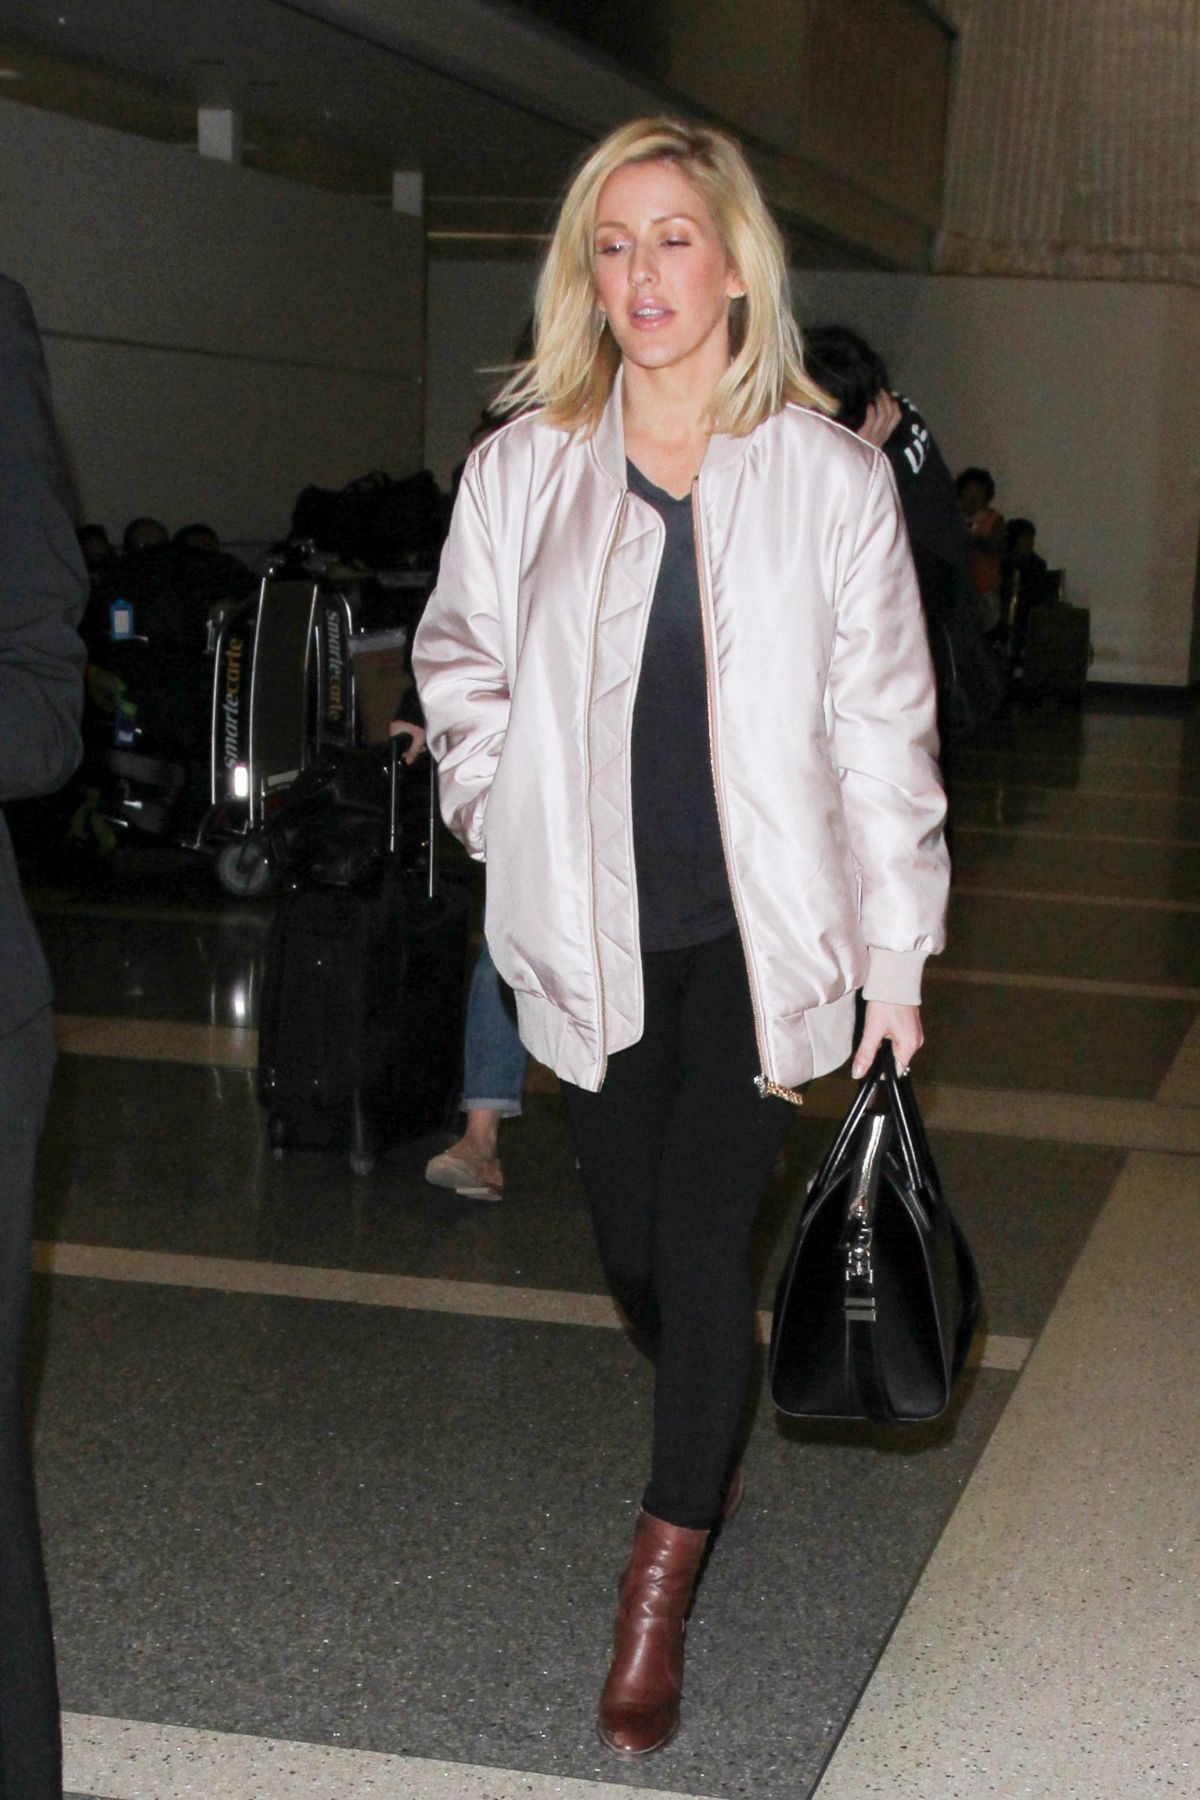 ELLIE GOULDING at LAX Airport in Los Angeles 11/25/2015